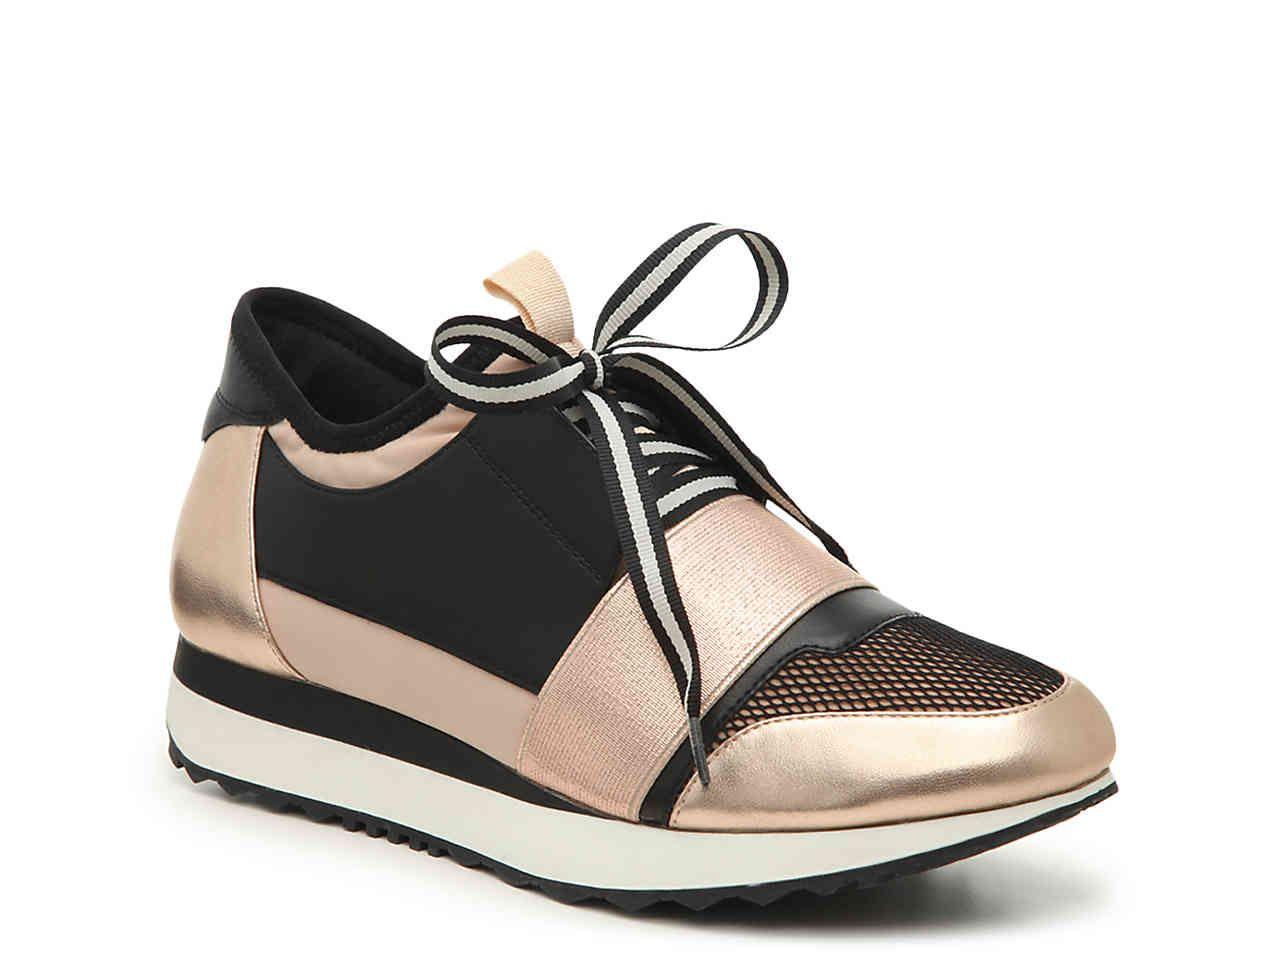 Madison Contribuyente imponer  Steve Madden Kaiyo Sneaker   Womens shoes sneakers, Womens running shoes,  Sneakers